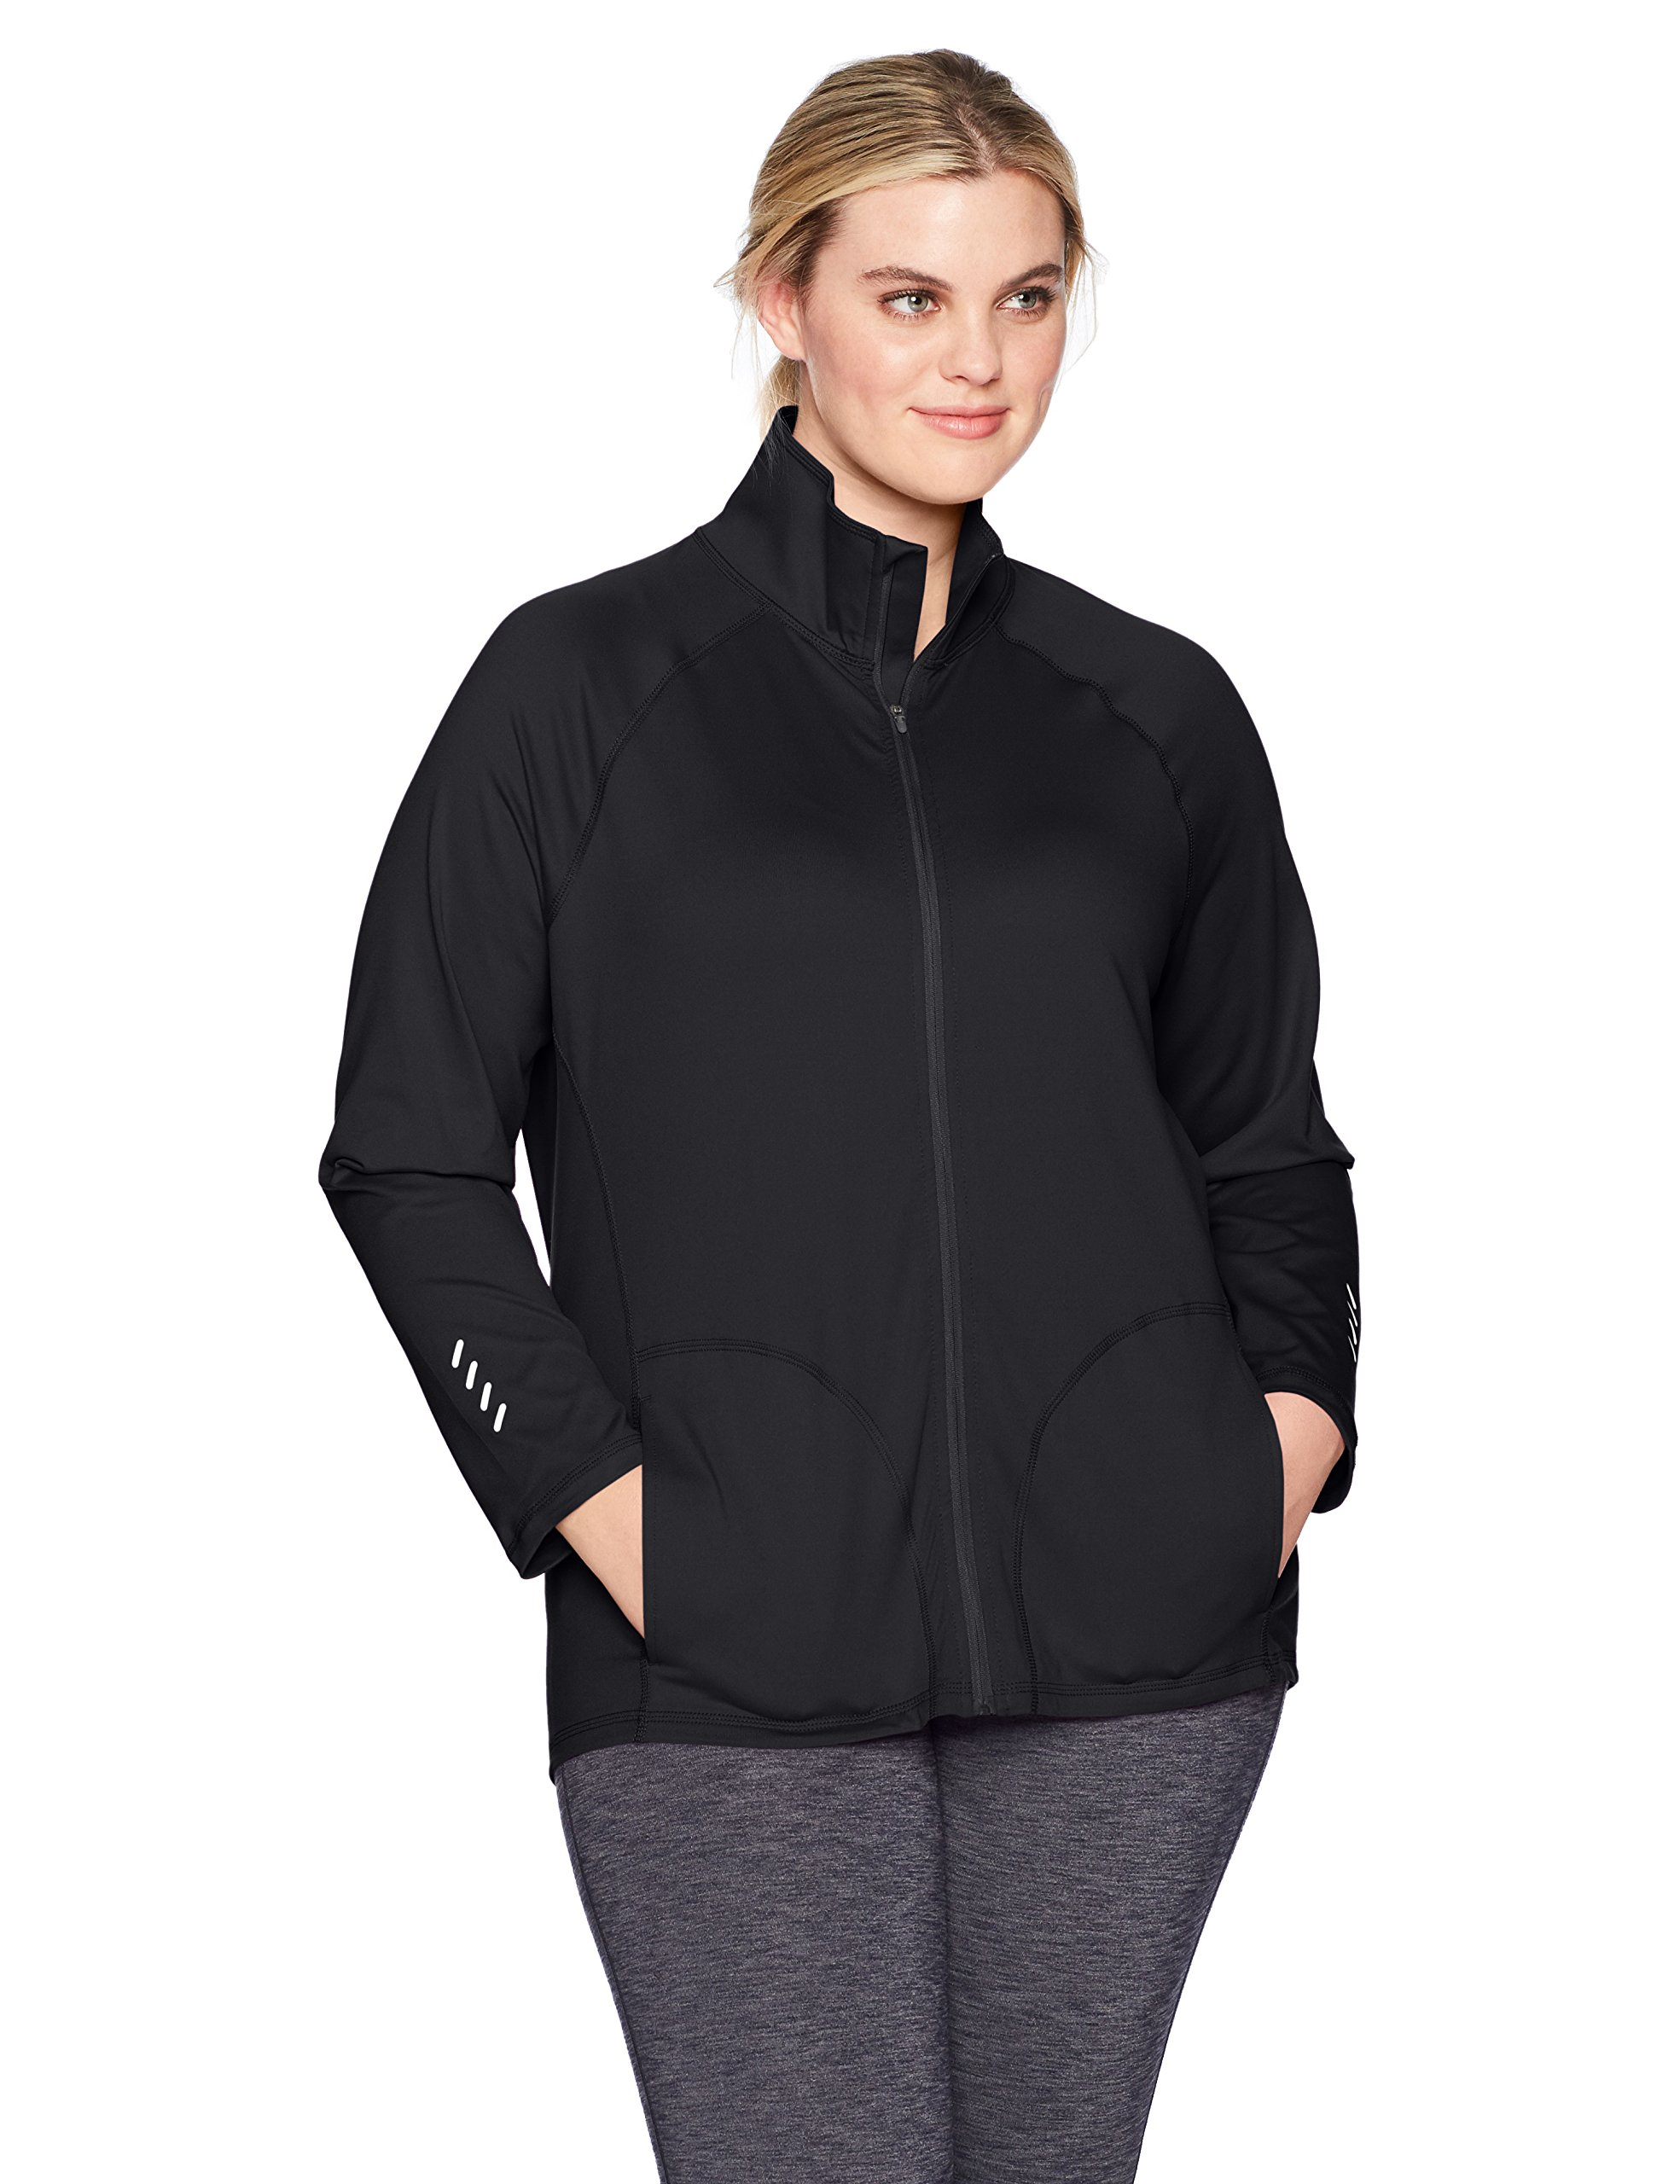 Just My Size Women's Plus Size Active Full-Zip Mock Neck Jacket, Black, 2X